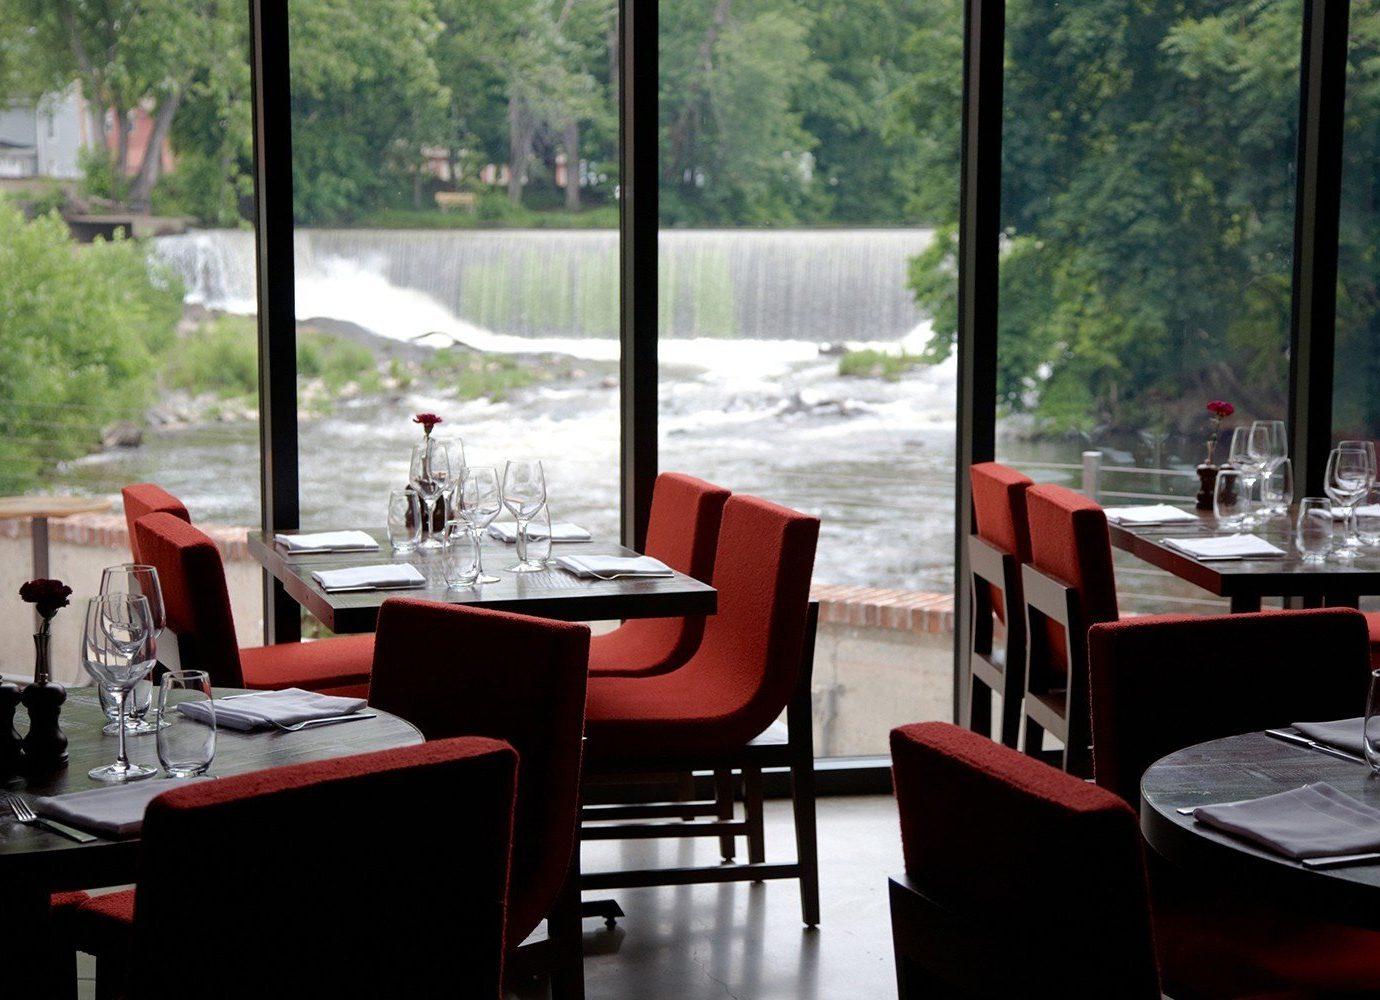 Trip Ideas window indoor table restaurant room meal interior design Bar Design dining room overlooking area dining table furniture